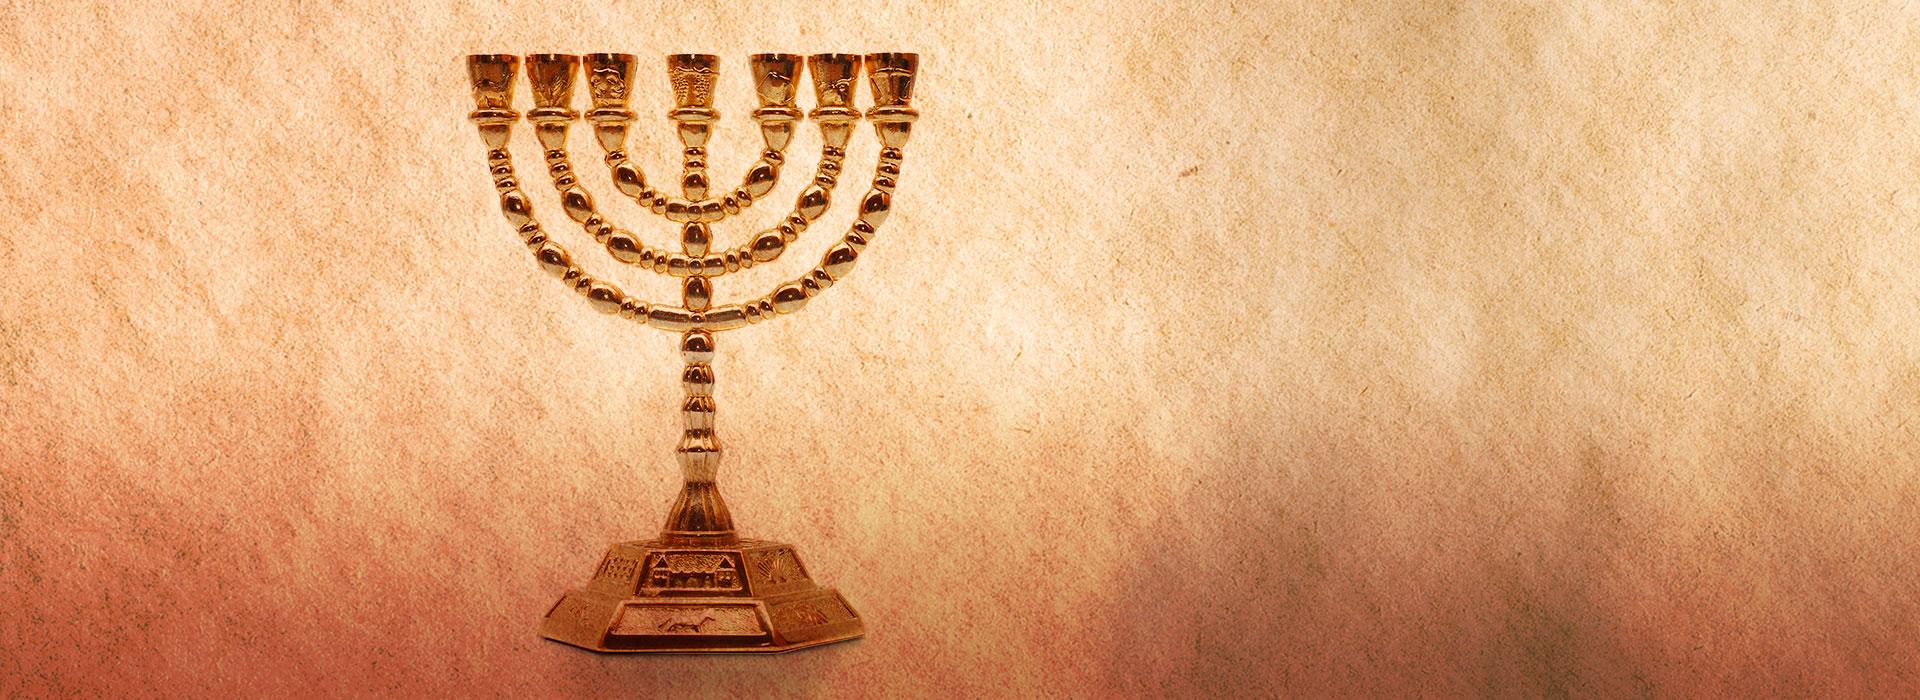 Três Aspectos do Candelabro de Ouro no Tabernáculo